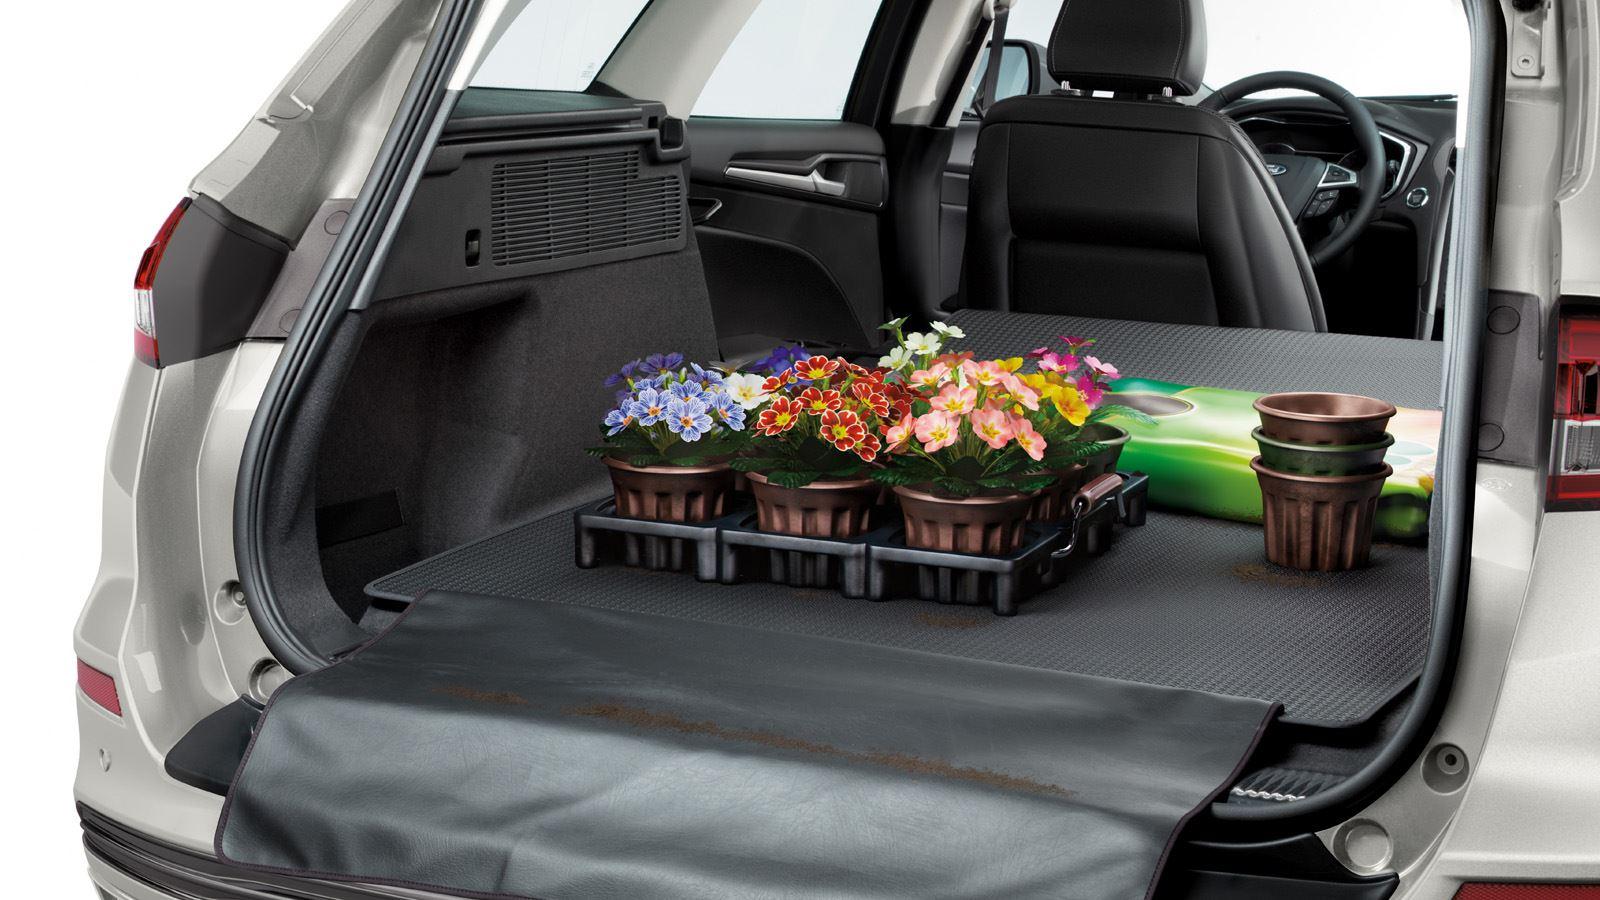 Ford Mondeo Hybrid Wagon interieurfoto4 1600x900px